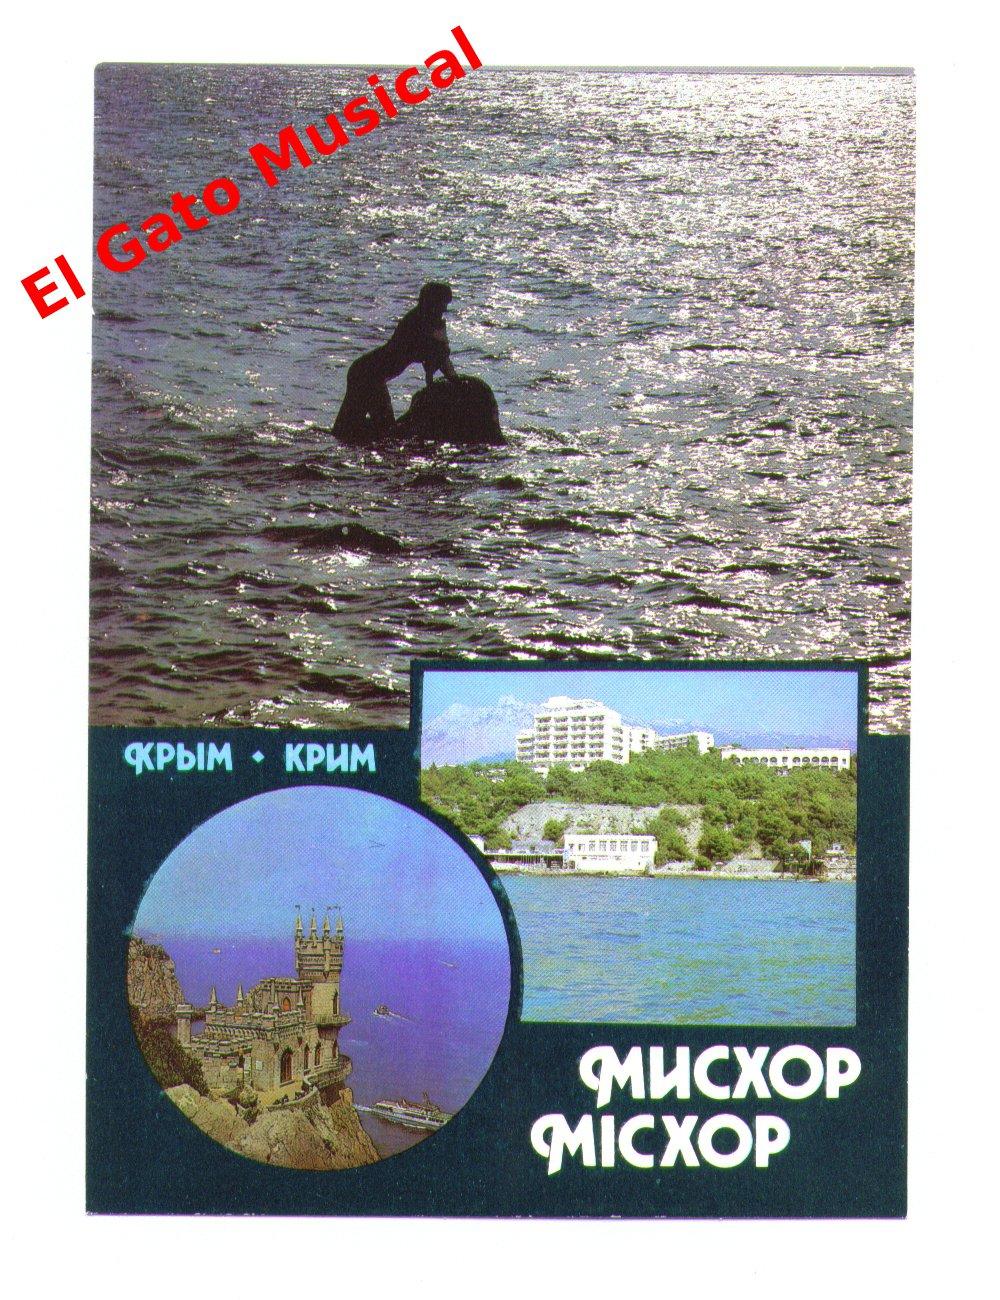 USSR Soviet Russian Postcard - Mishor Crimea 1980s